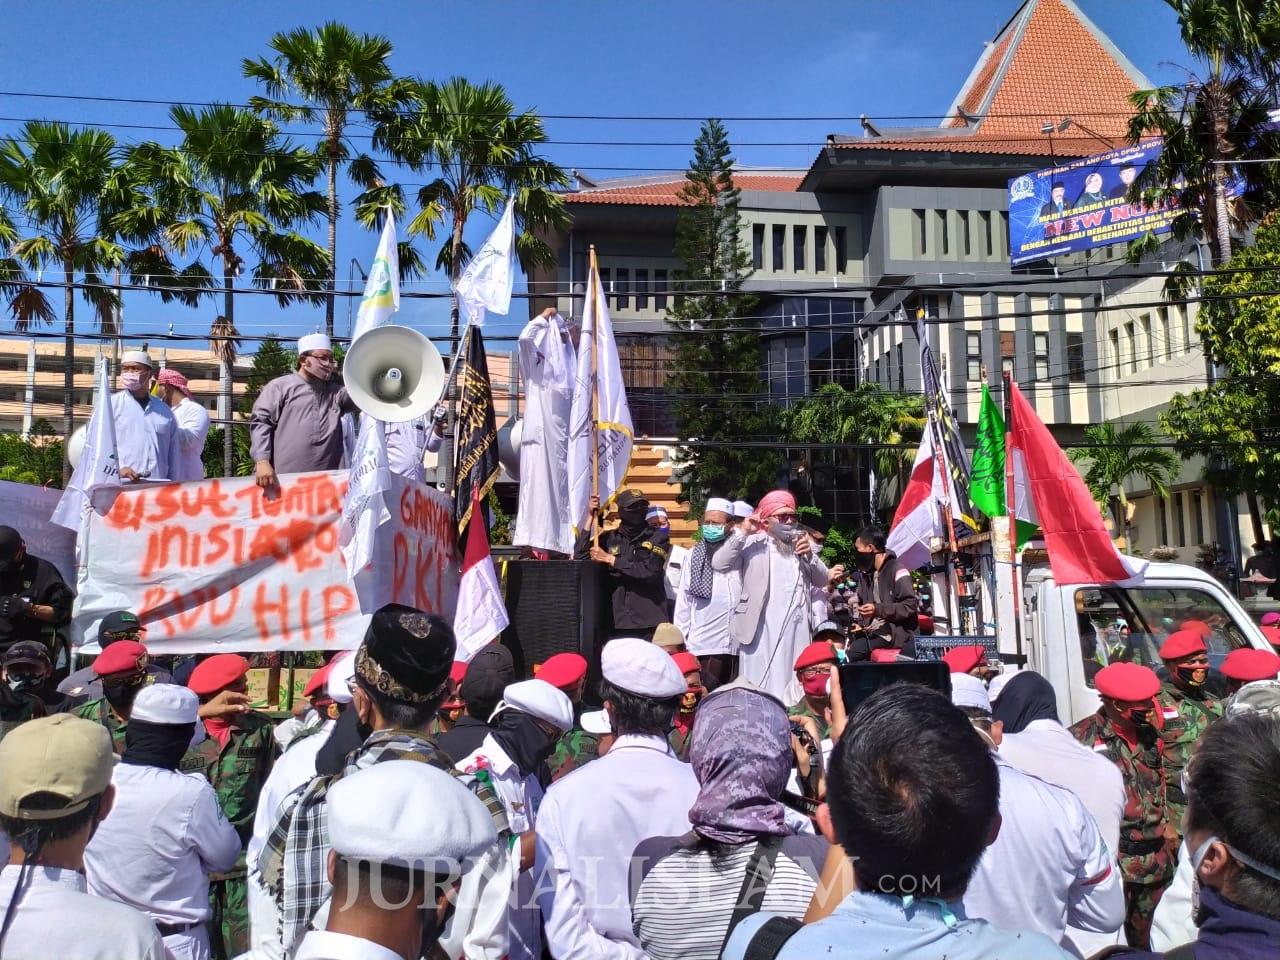 Ribuan Massa Anti Komunis Surabaya Desak Inisiator RUU HIP Ditangkap